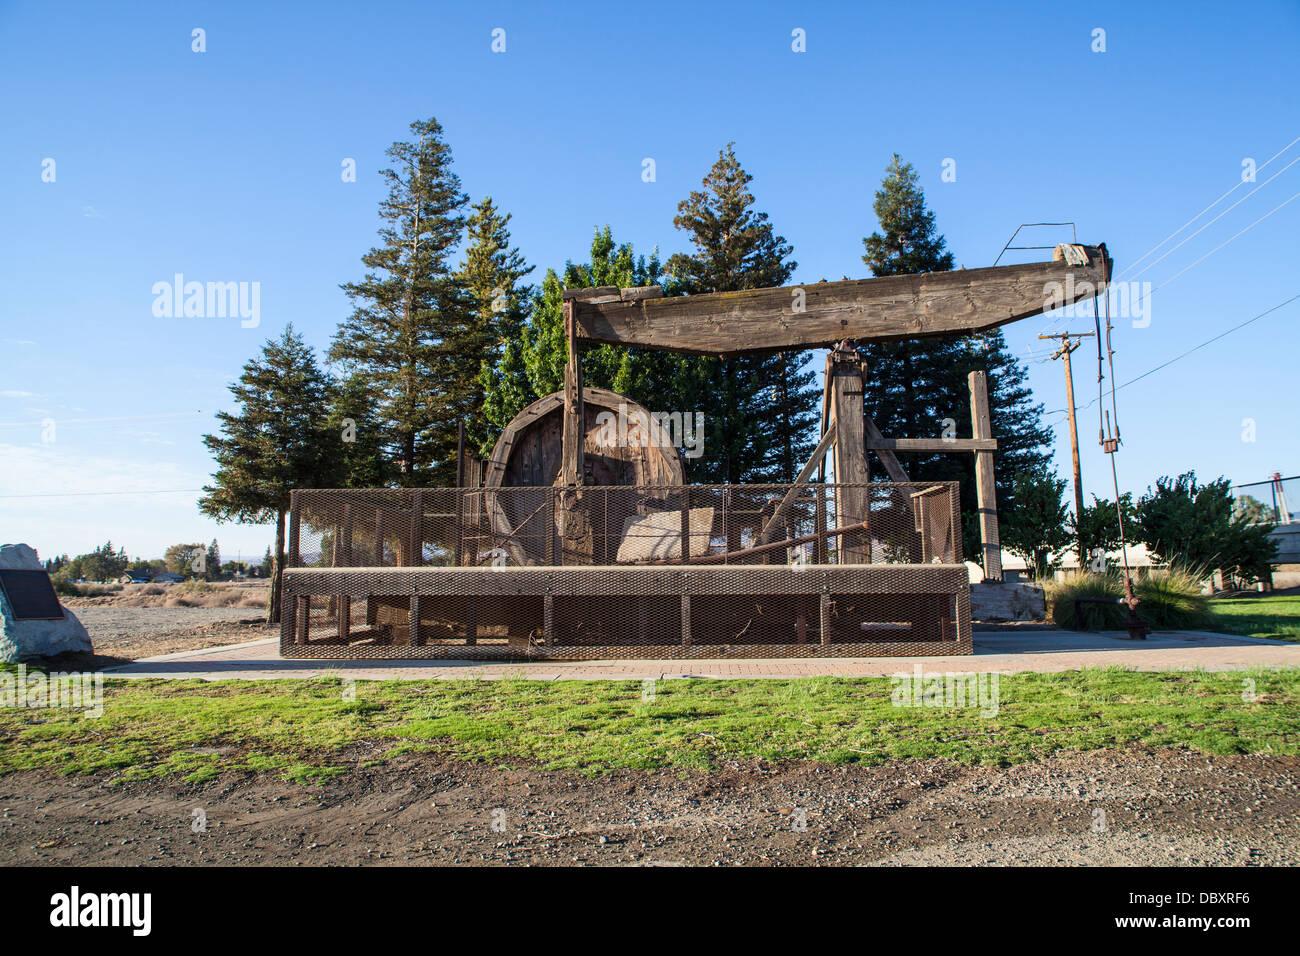 A Wooden Walking Beam Oil Pump In Coalinga California